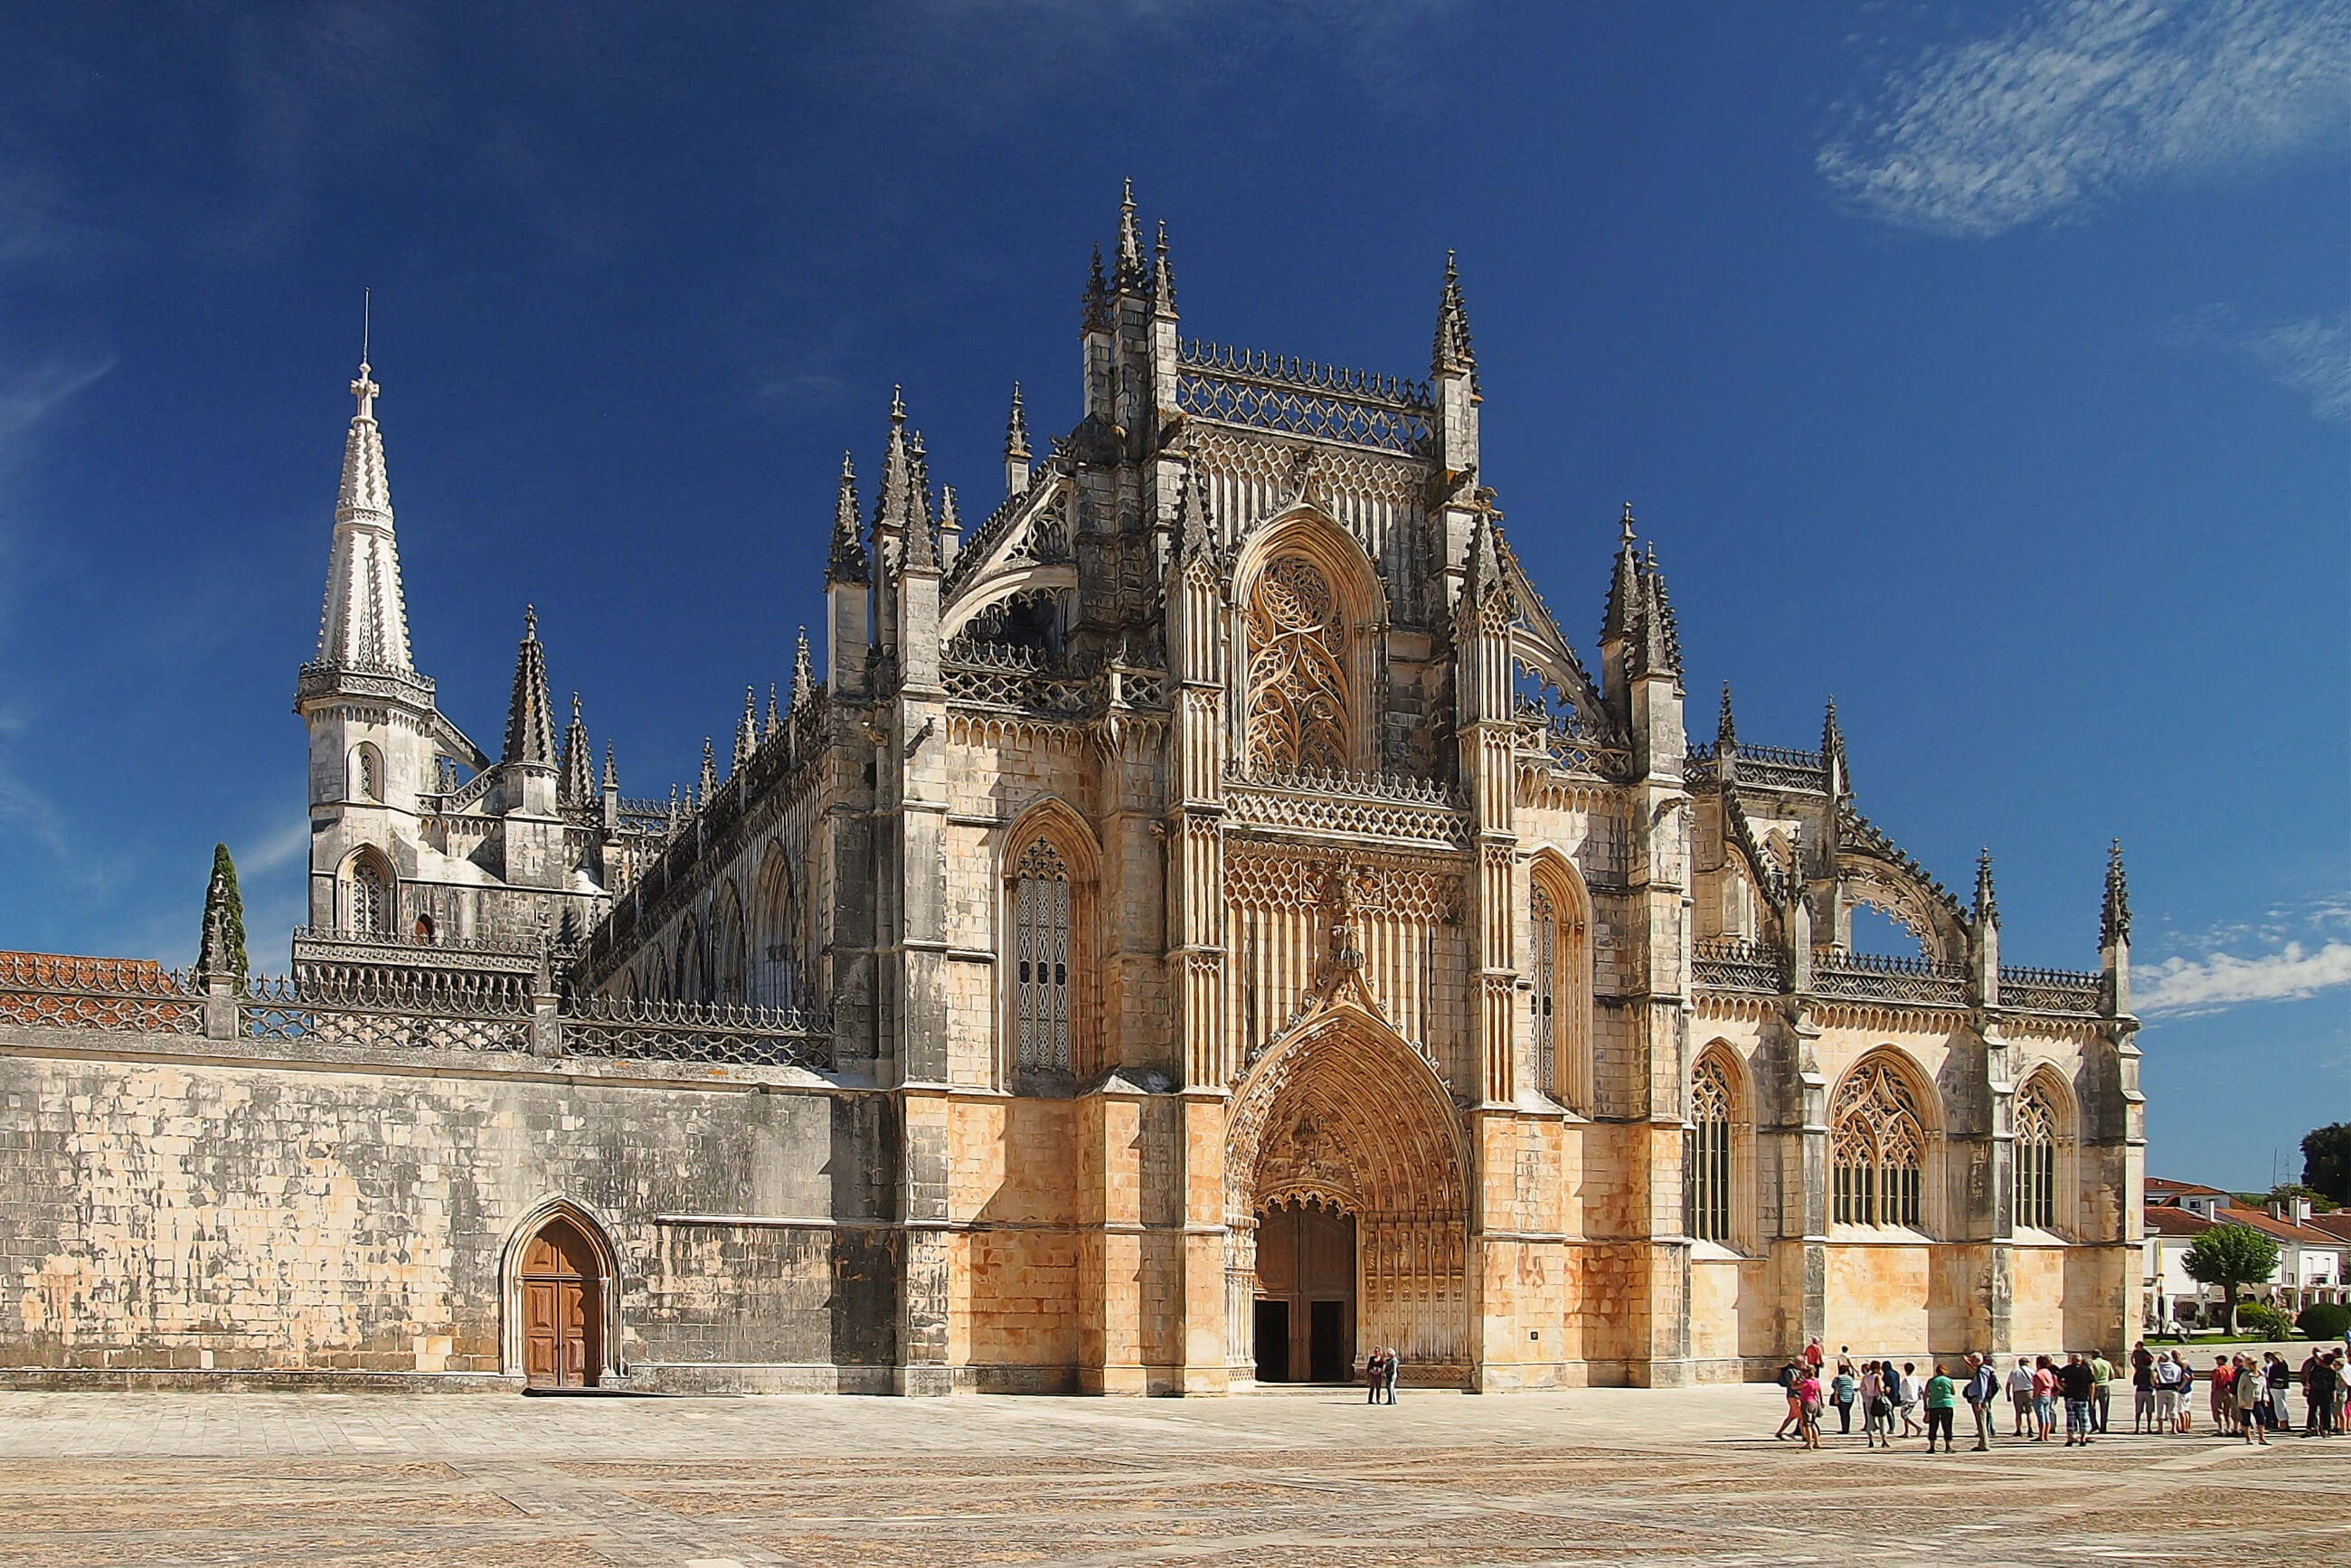 https://bubo.sk/uploads/galleries/7377/pxb_portugalsko_batalha_monastery-3590443.jpg